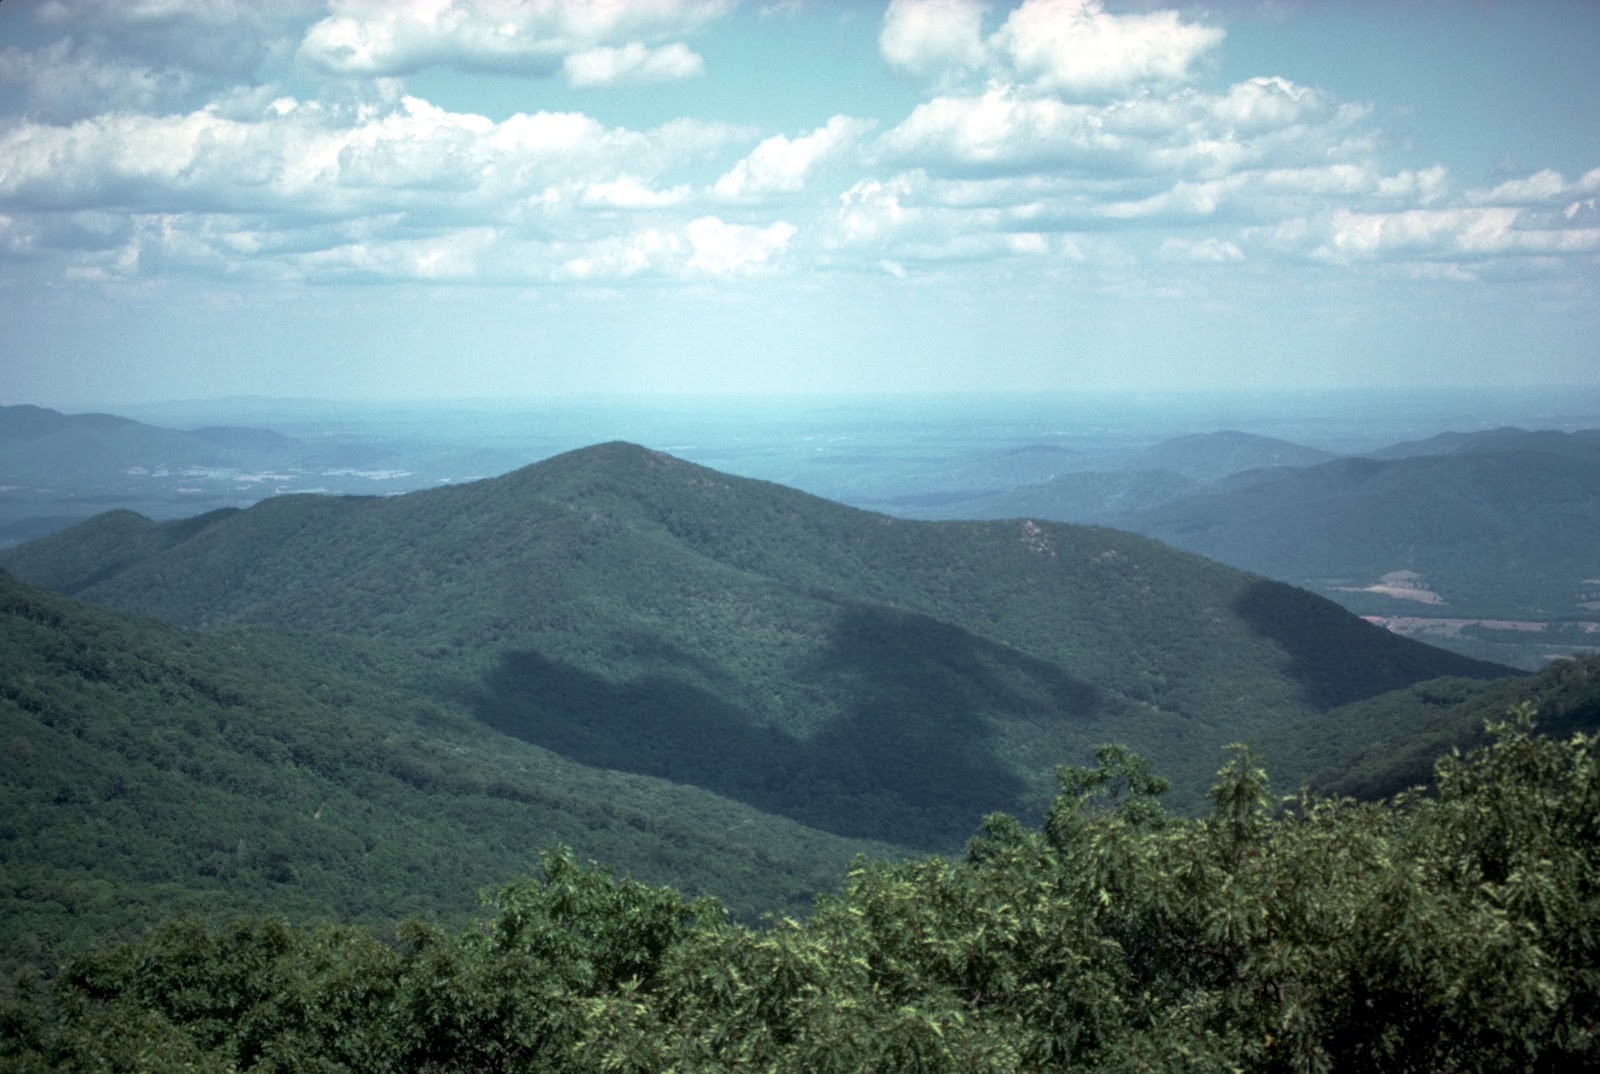 Appalachian Natural Beauty